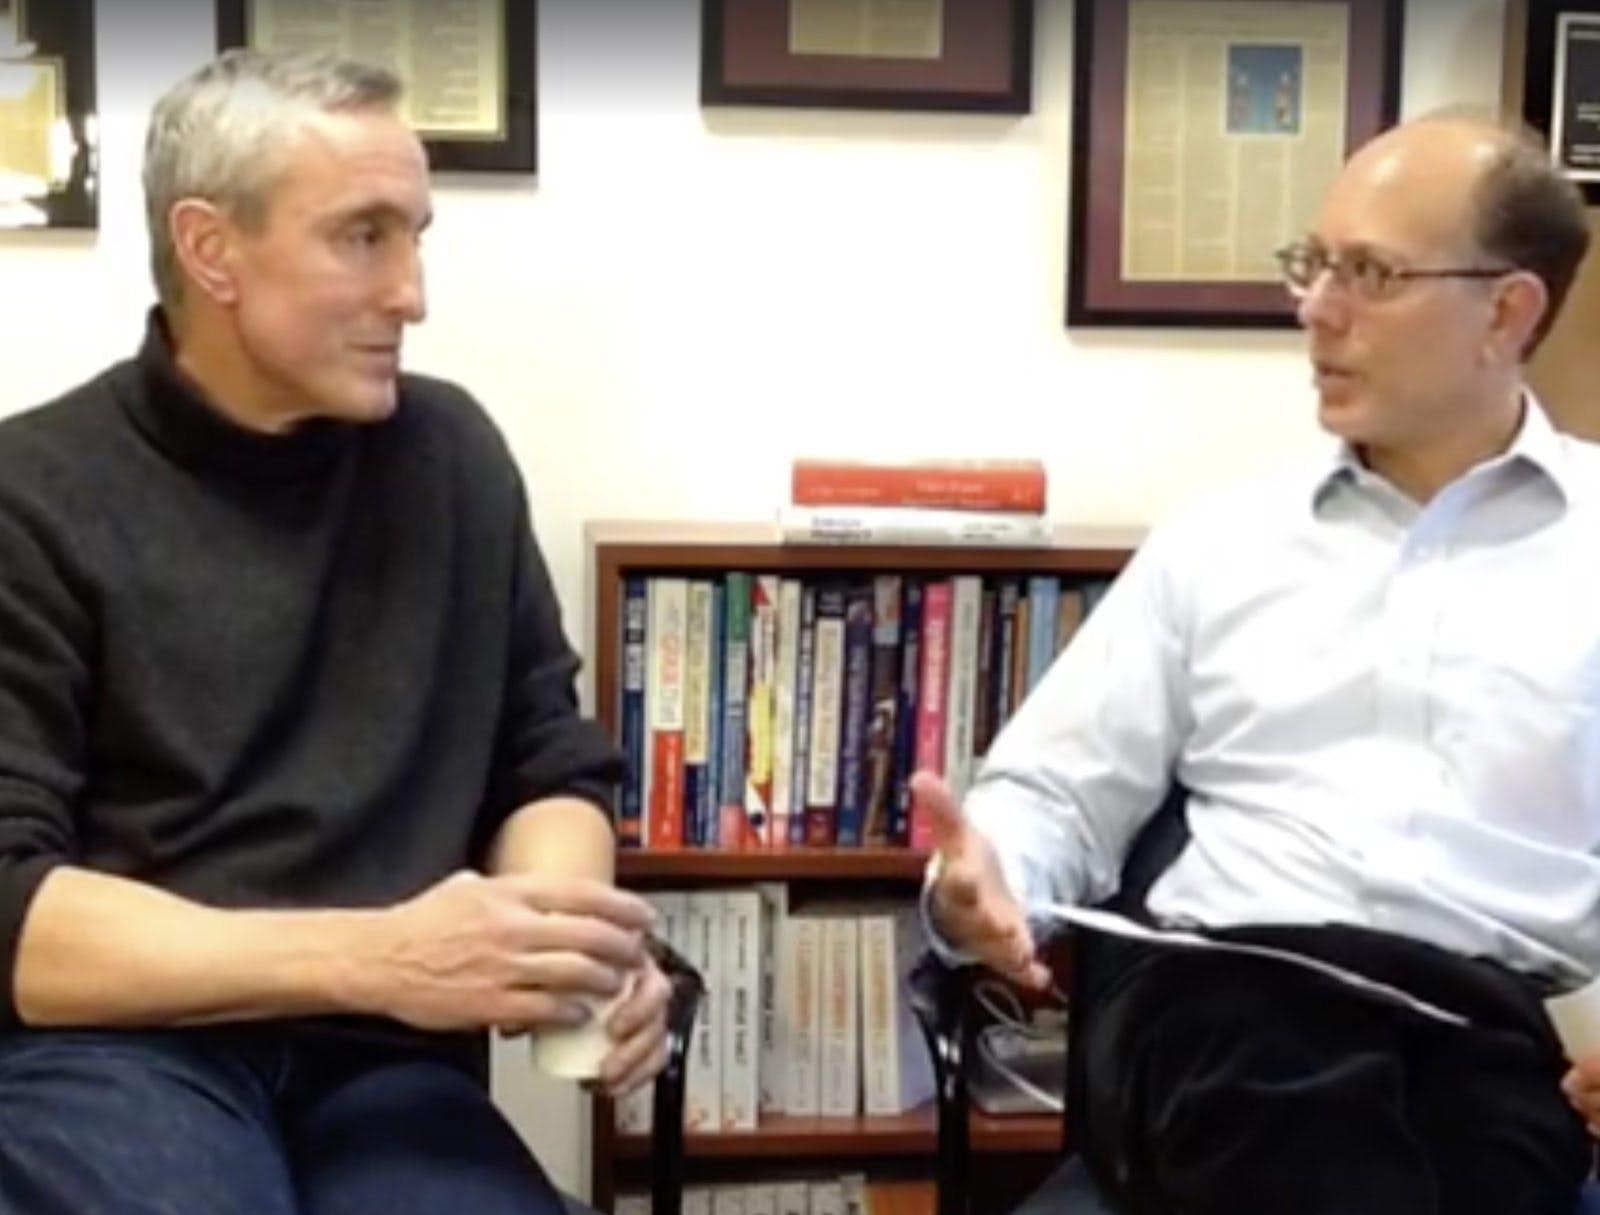 Konversation mellan dr David Ludwig och Gary Taubes